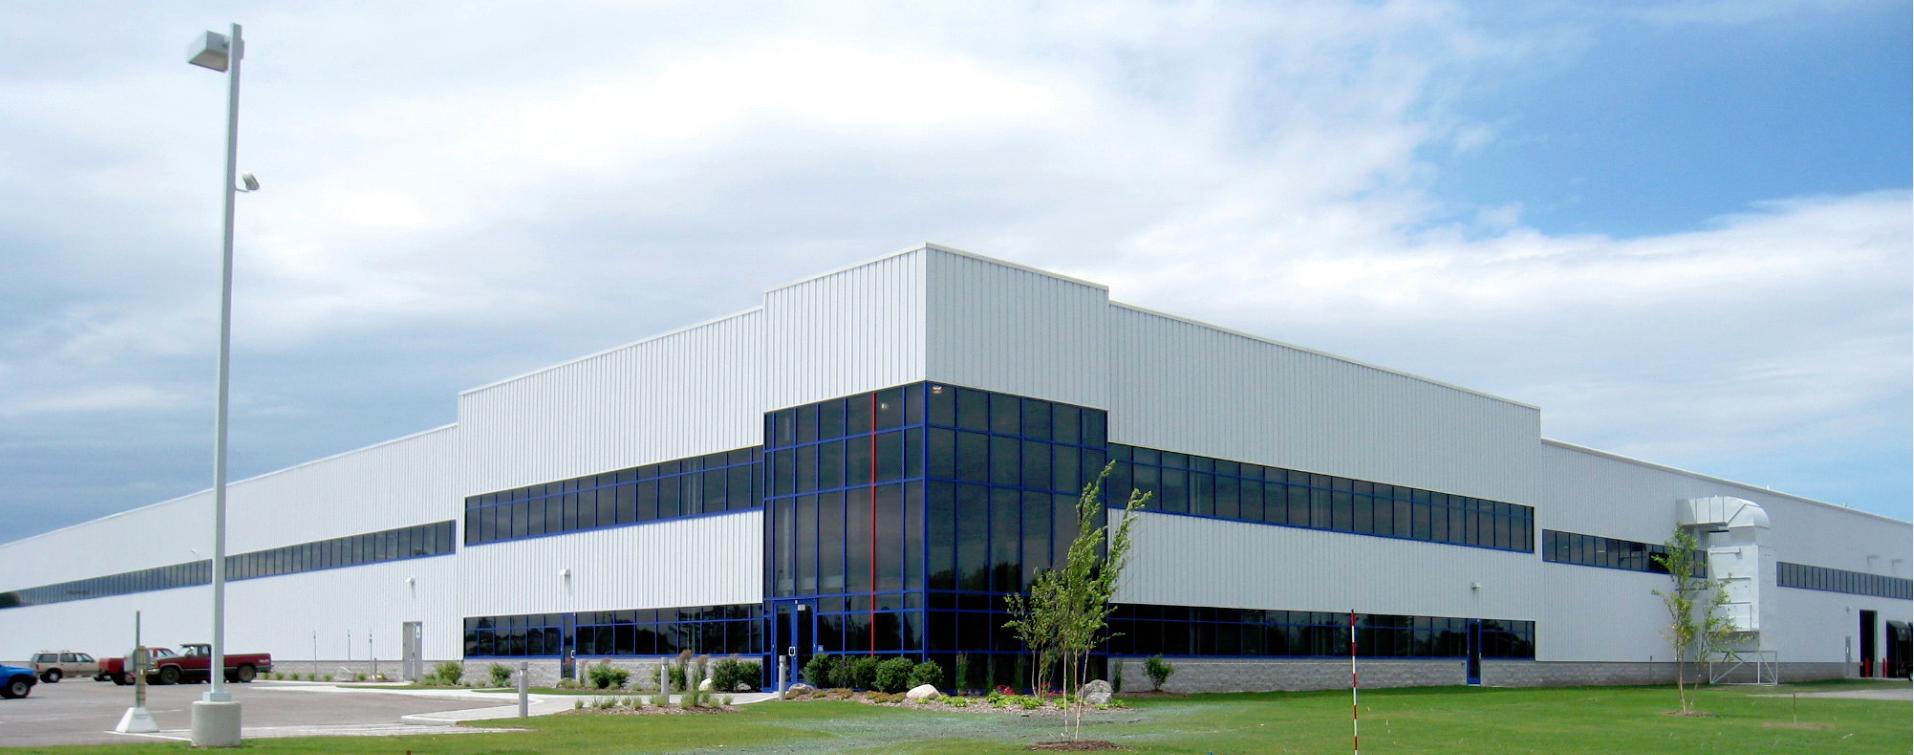 Wacker Neuson Wisconsin Offices